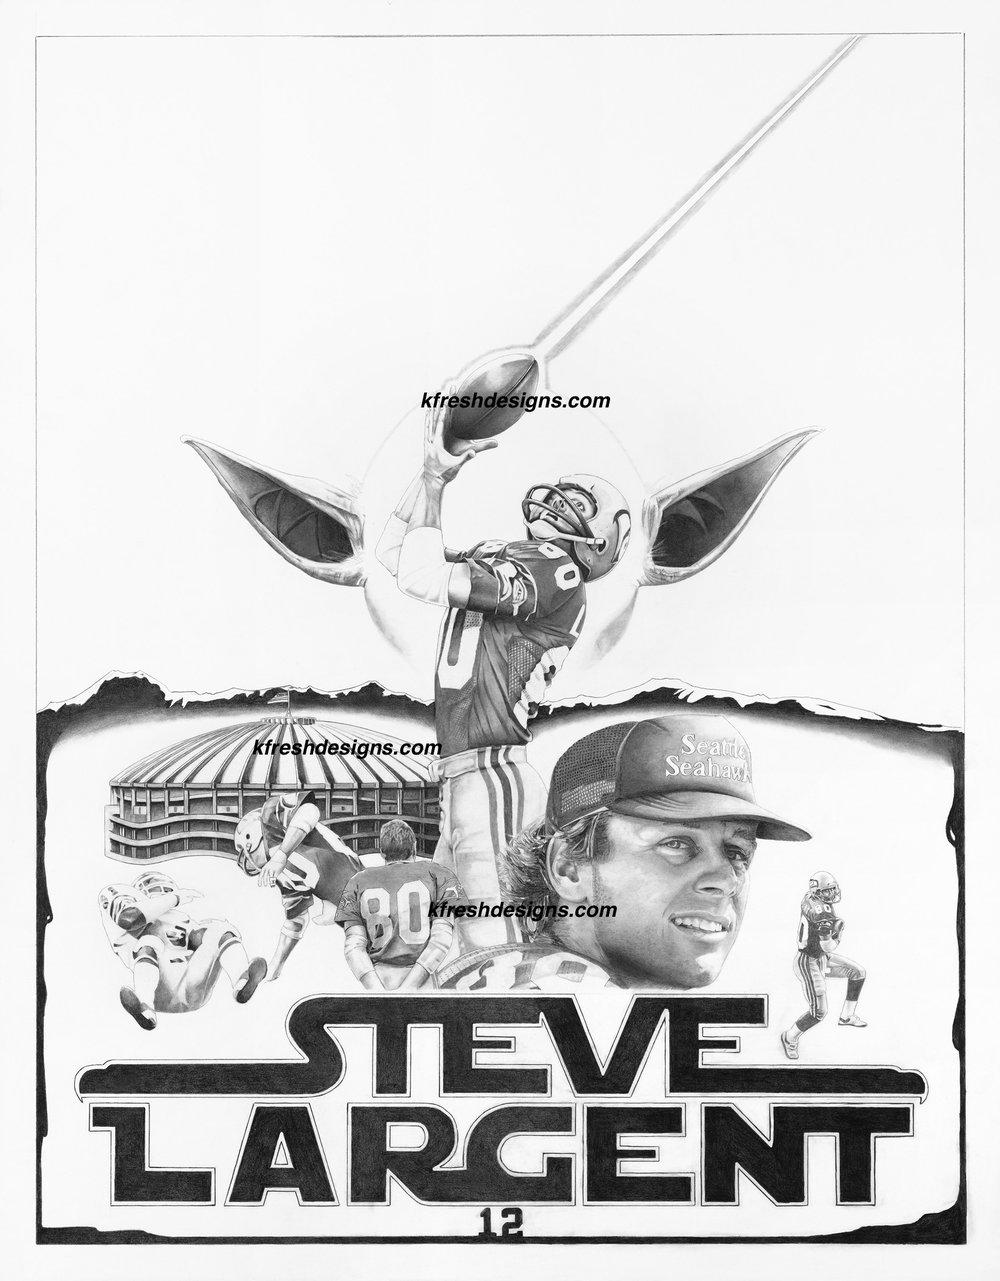 Steve Largent jpeg.jpg